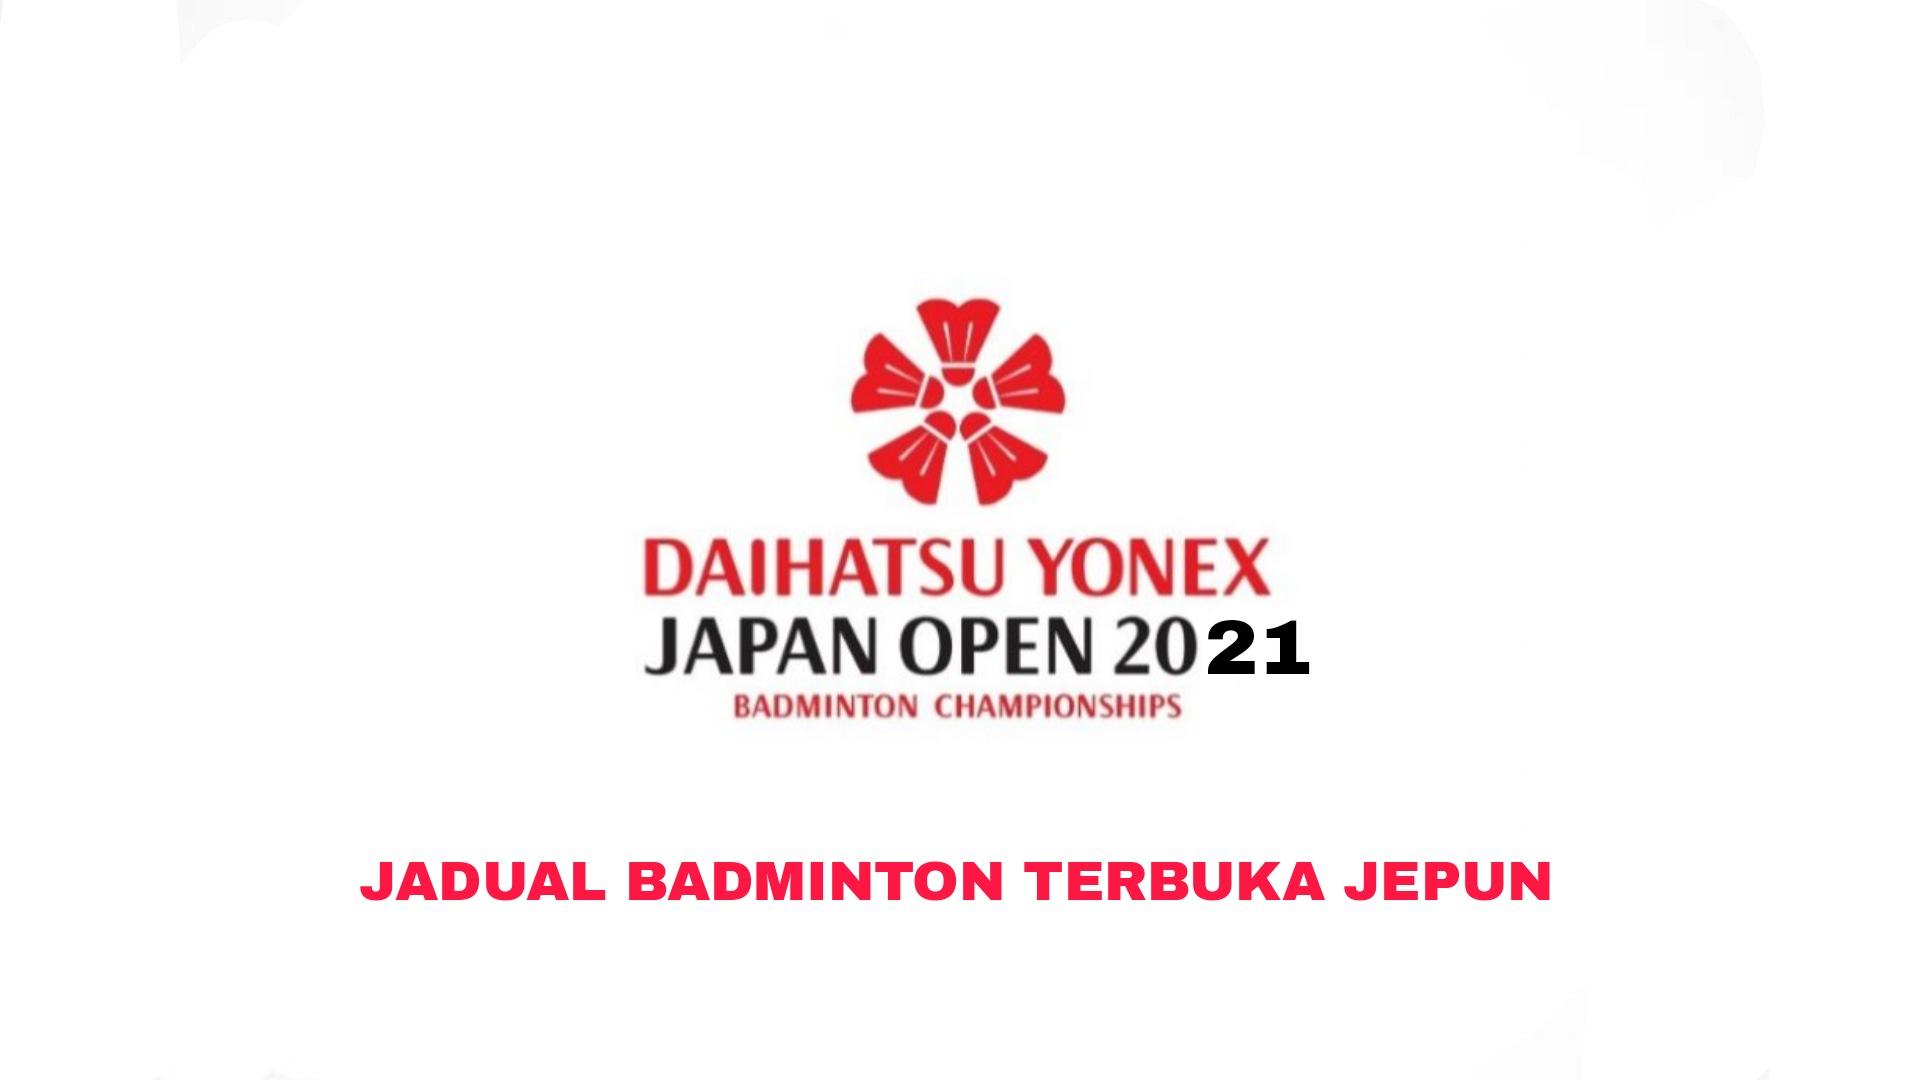 Jadual Badminton Terbuka Jepun 2021 (Keputusan)